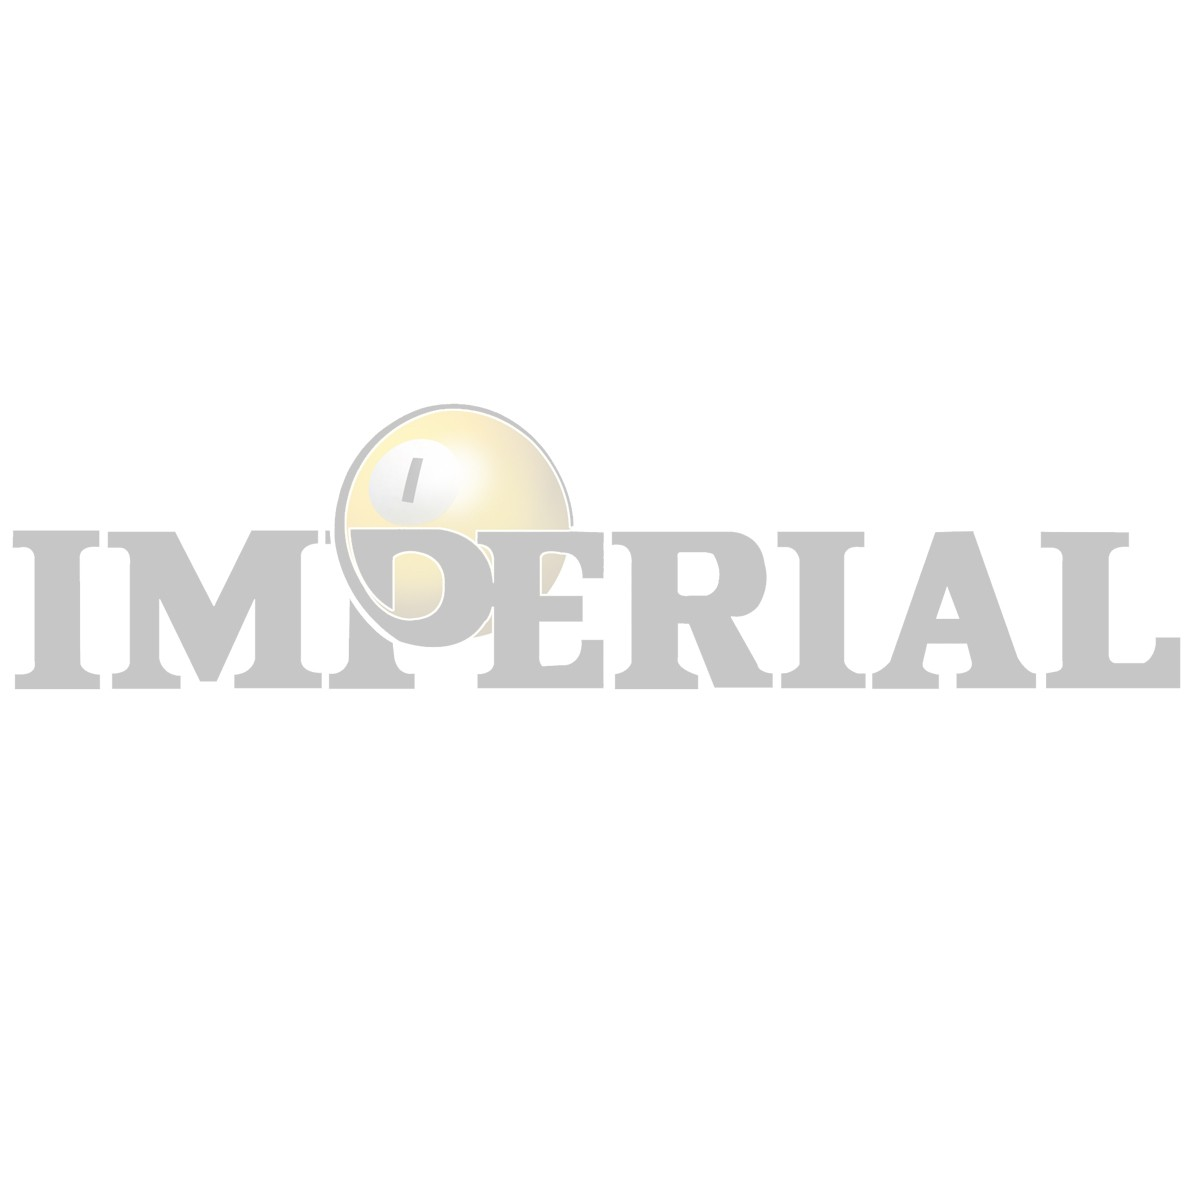 Kansas City Royals Home vs. Away Billiard Ball Set